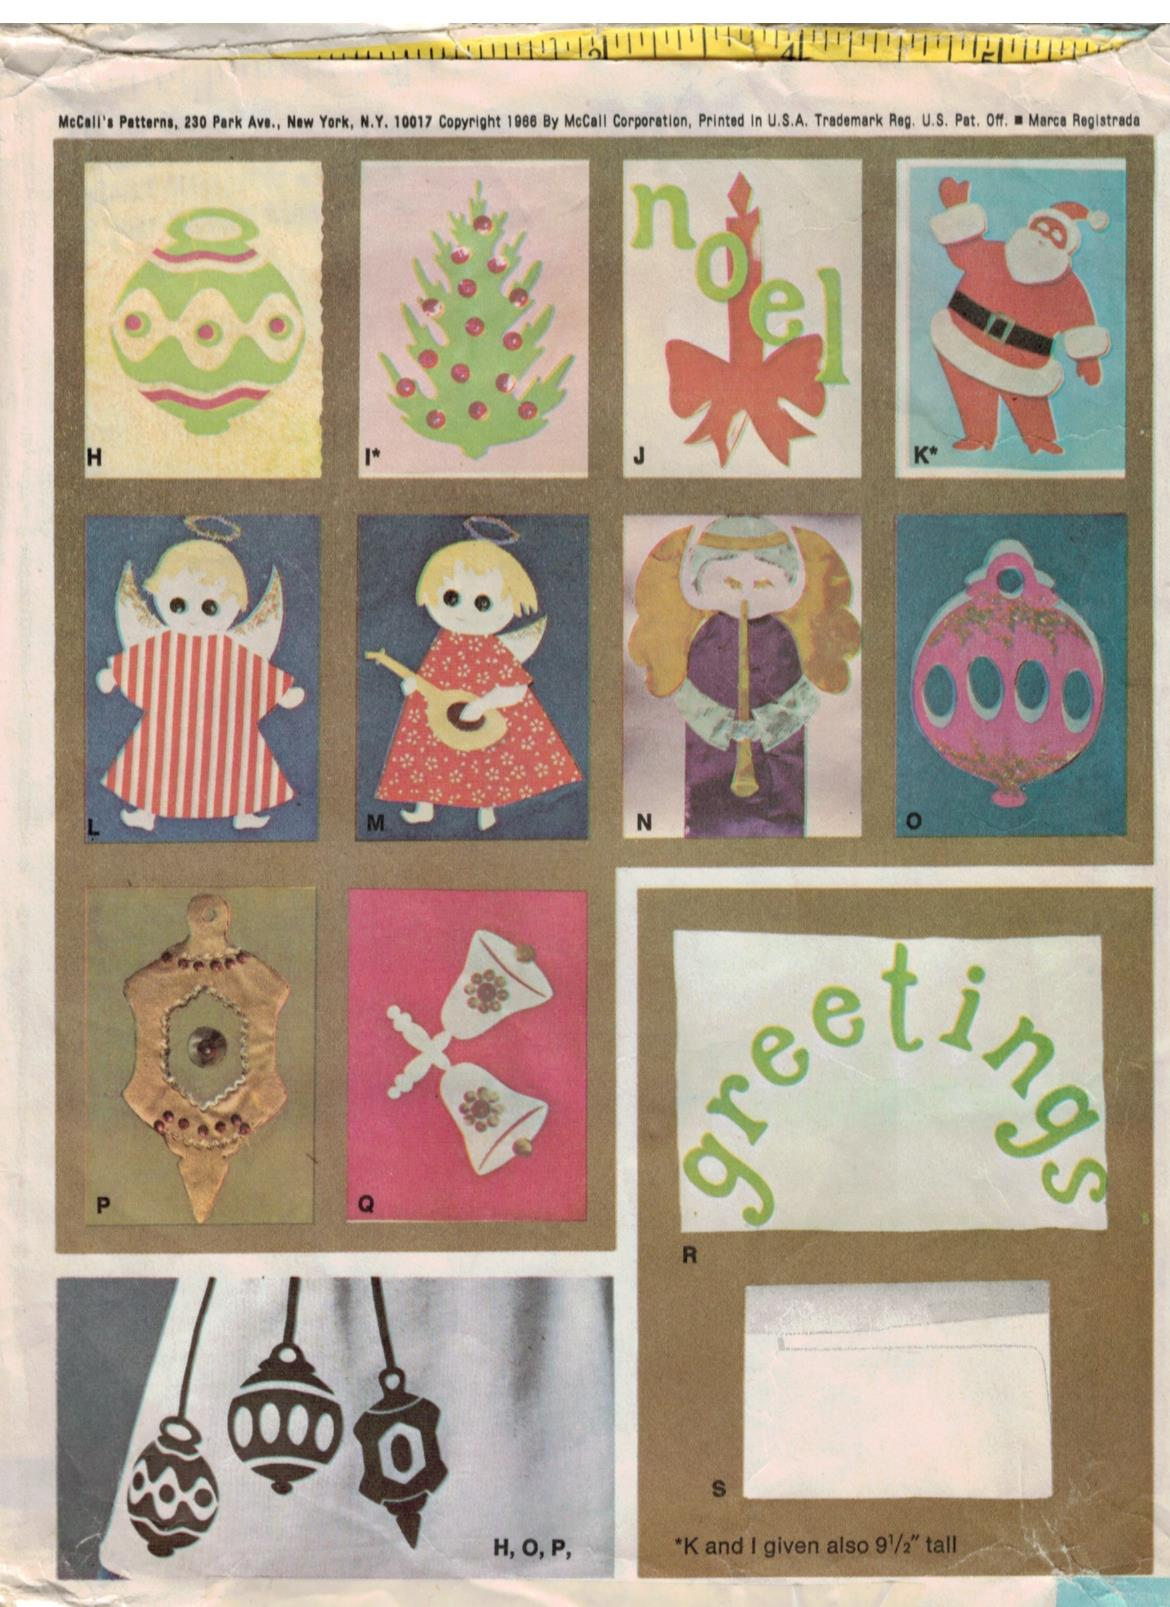 Vintage McCalls #1997 Christmas Applique Motifs circa 1950